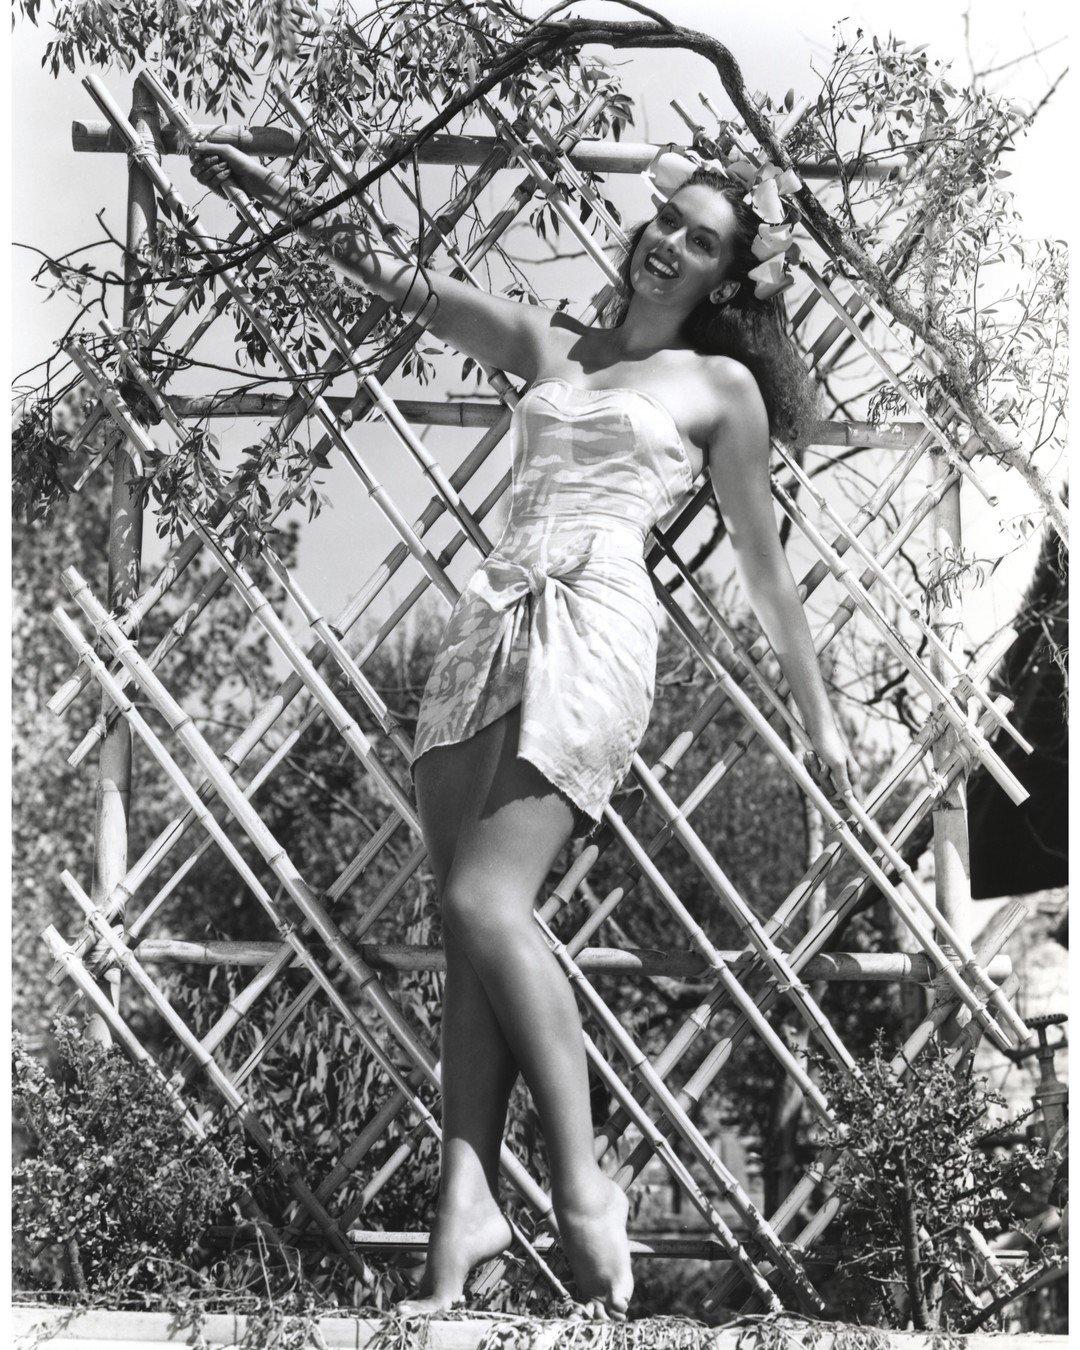 Susan Ward,Doris Dowling Adult pictures Timothy Spall (born 1957),Veronica Hamel